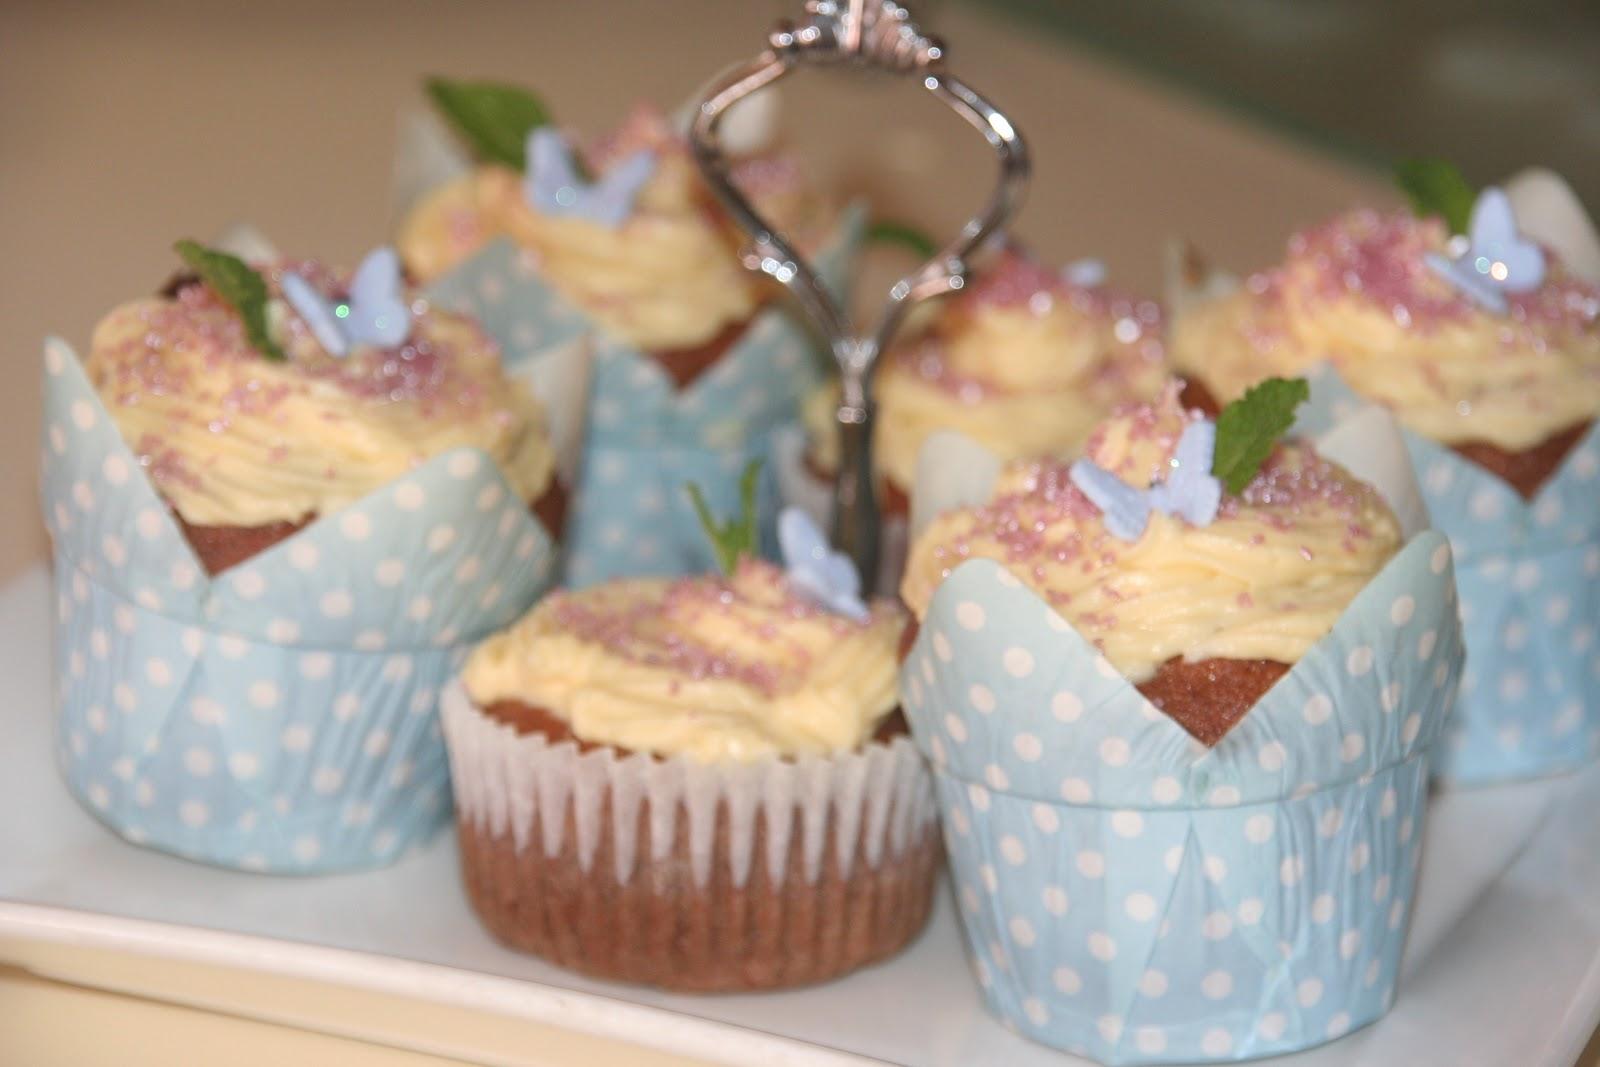 http://2.bp.blogspot.com/-iWRsn5q4rFs/Tow4m6krfQI/AAAAAAAAAIM/h9HNIUelURU/s1600/chicken+lasagne+and+cup+cakes+023.JPG